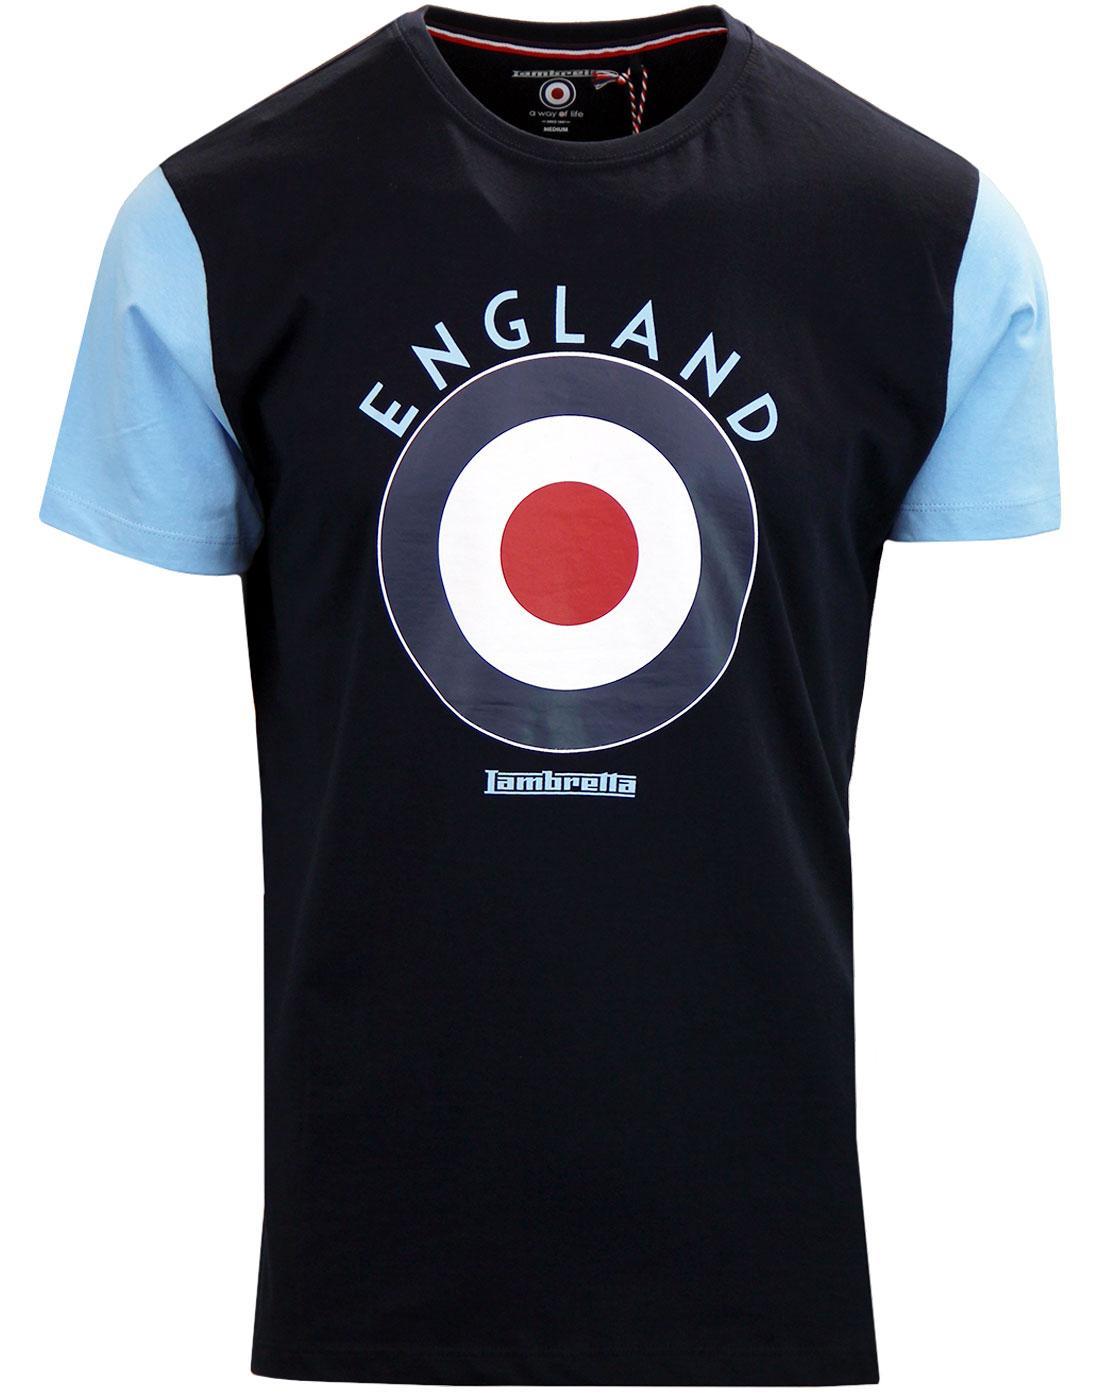 LAMBRETTA Retro Mod Target England Football Tee N